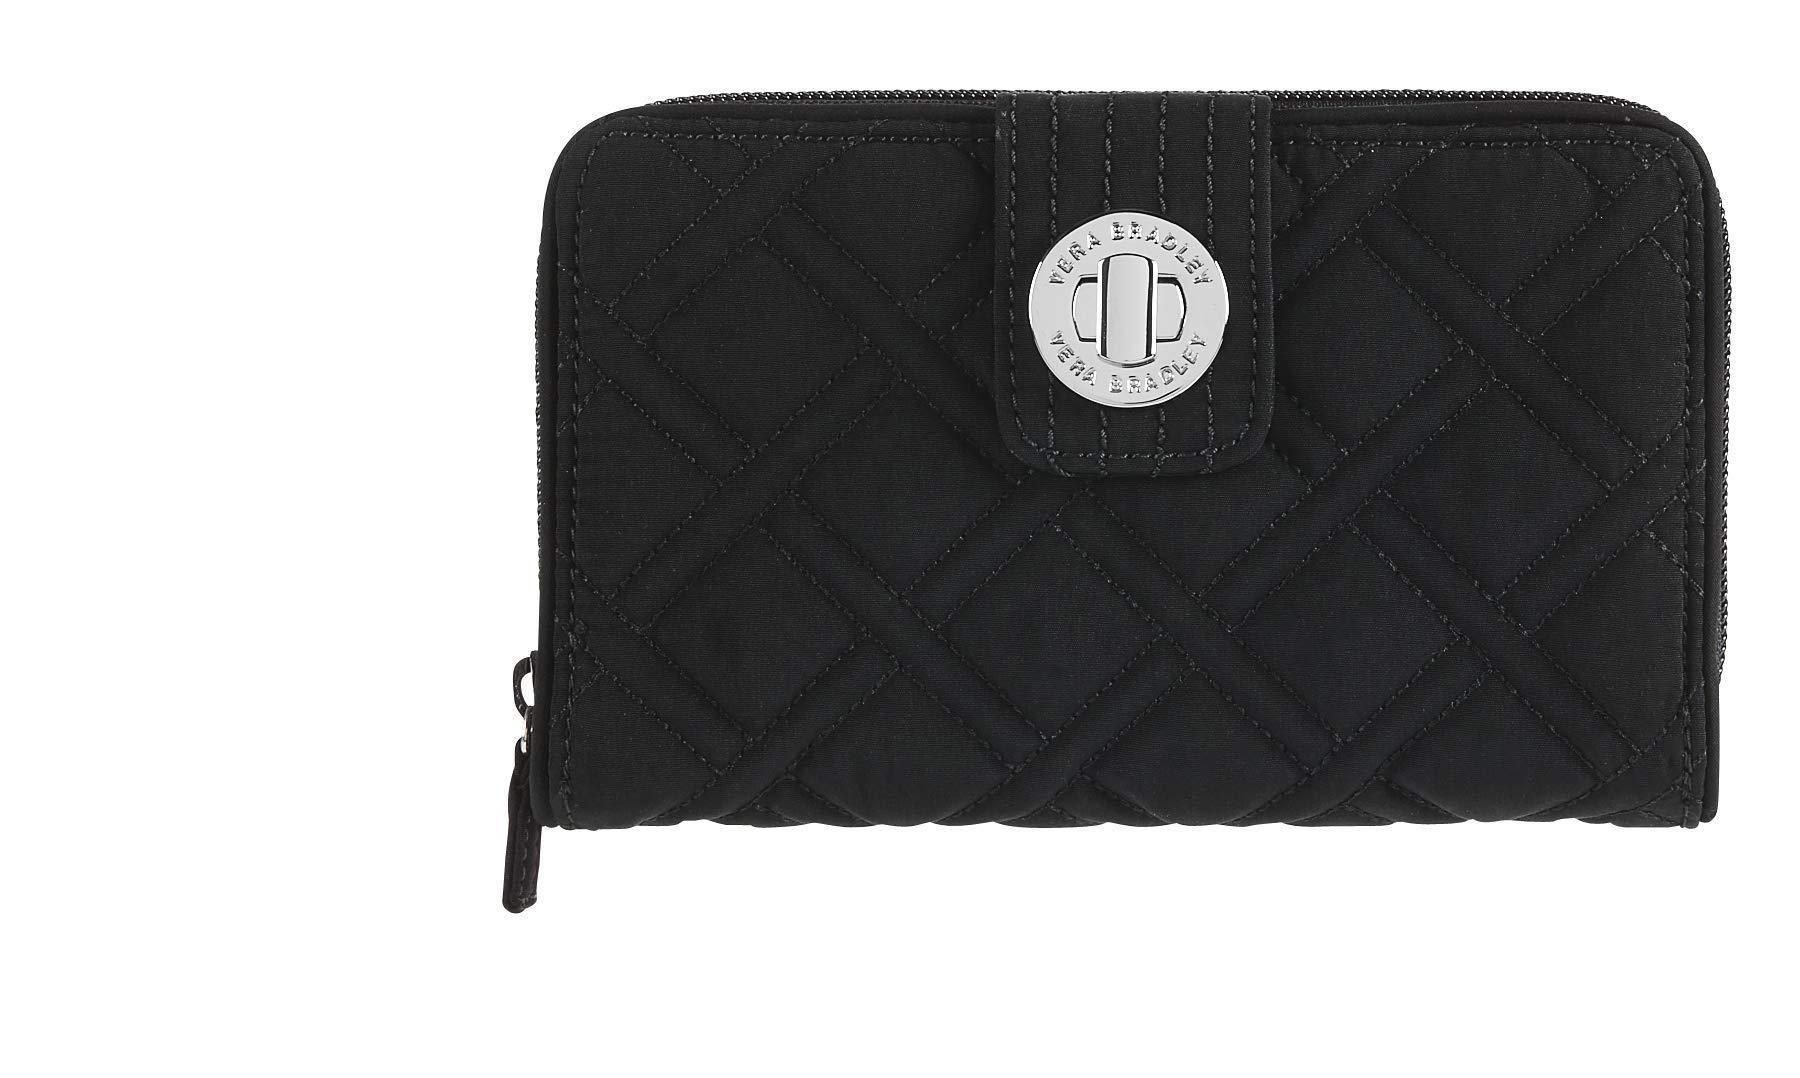 Vera Bradley Turnlock Wallet, Classic Black, One Size